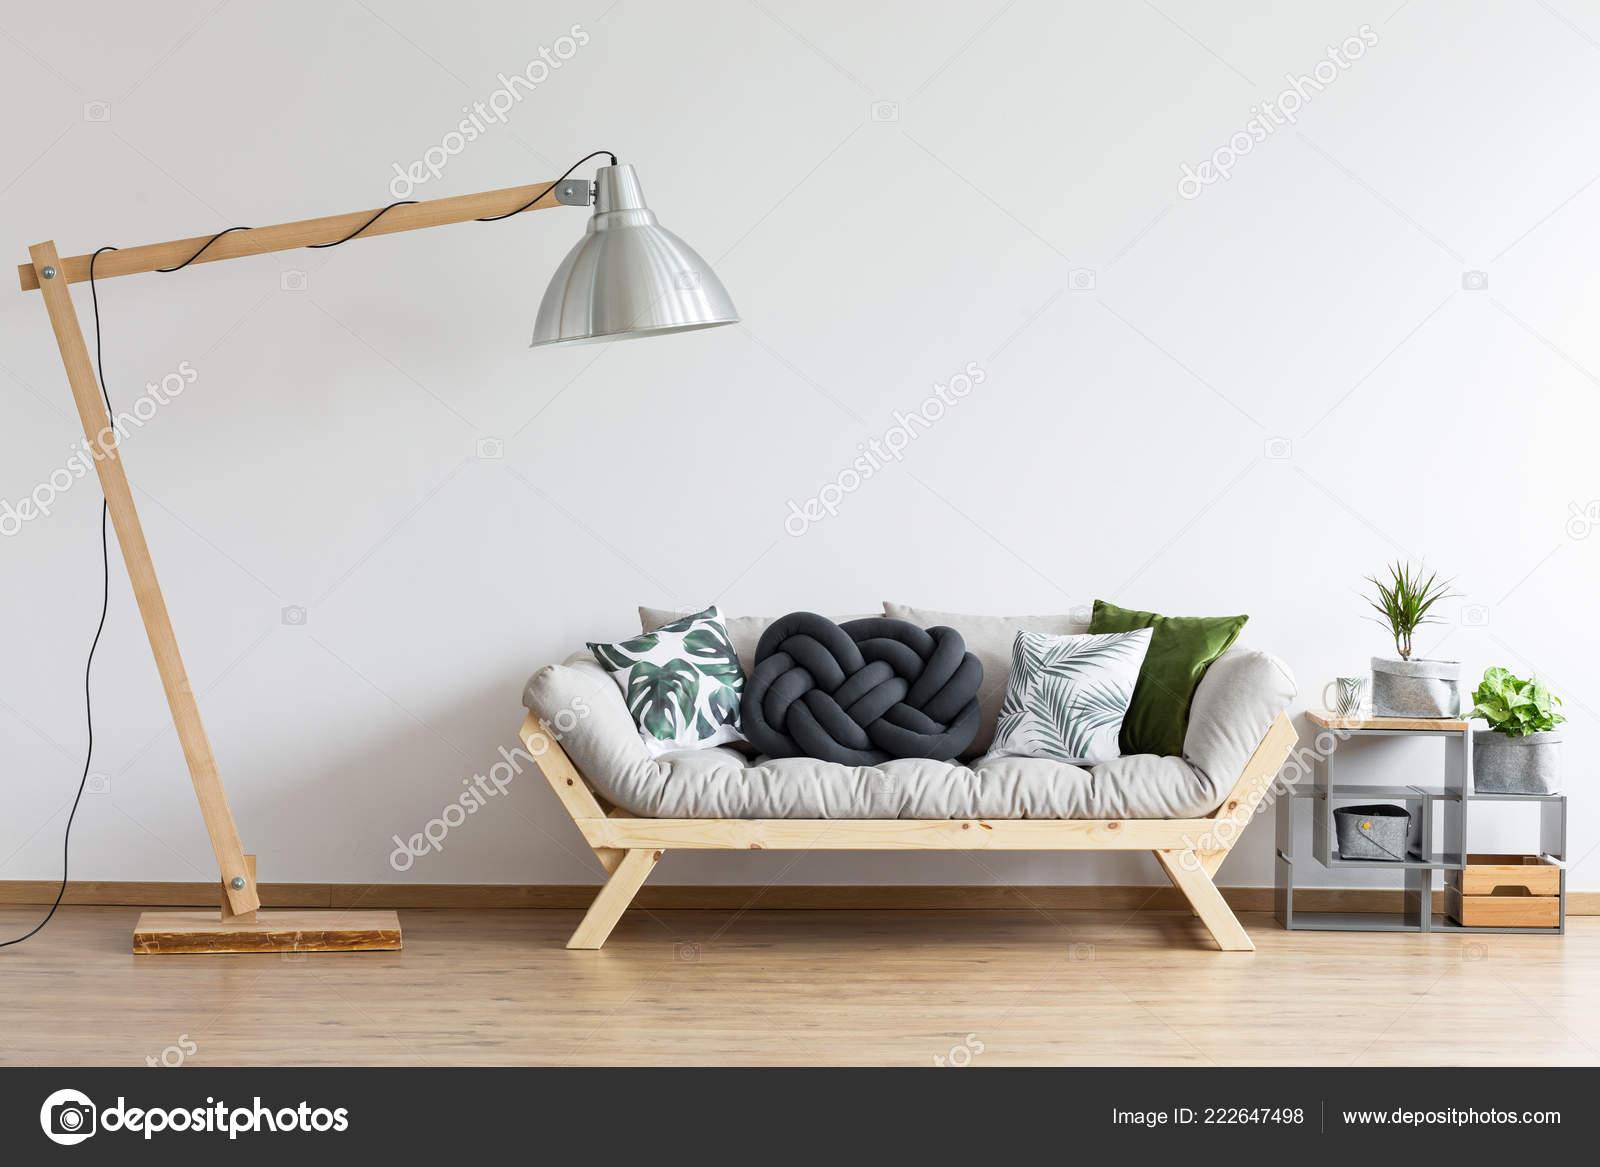 Phenomenal Stylish Oversize Lamp Next Scandinavian Sofa Pillows Minimal Dailytribune Chair Design For Home Dailytribuneorg